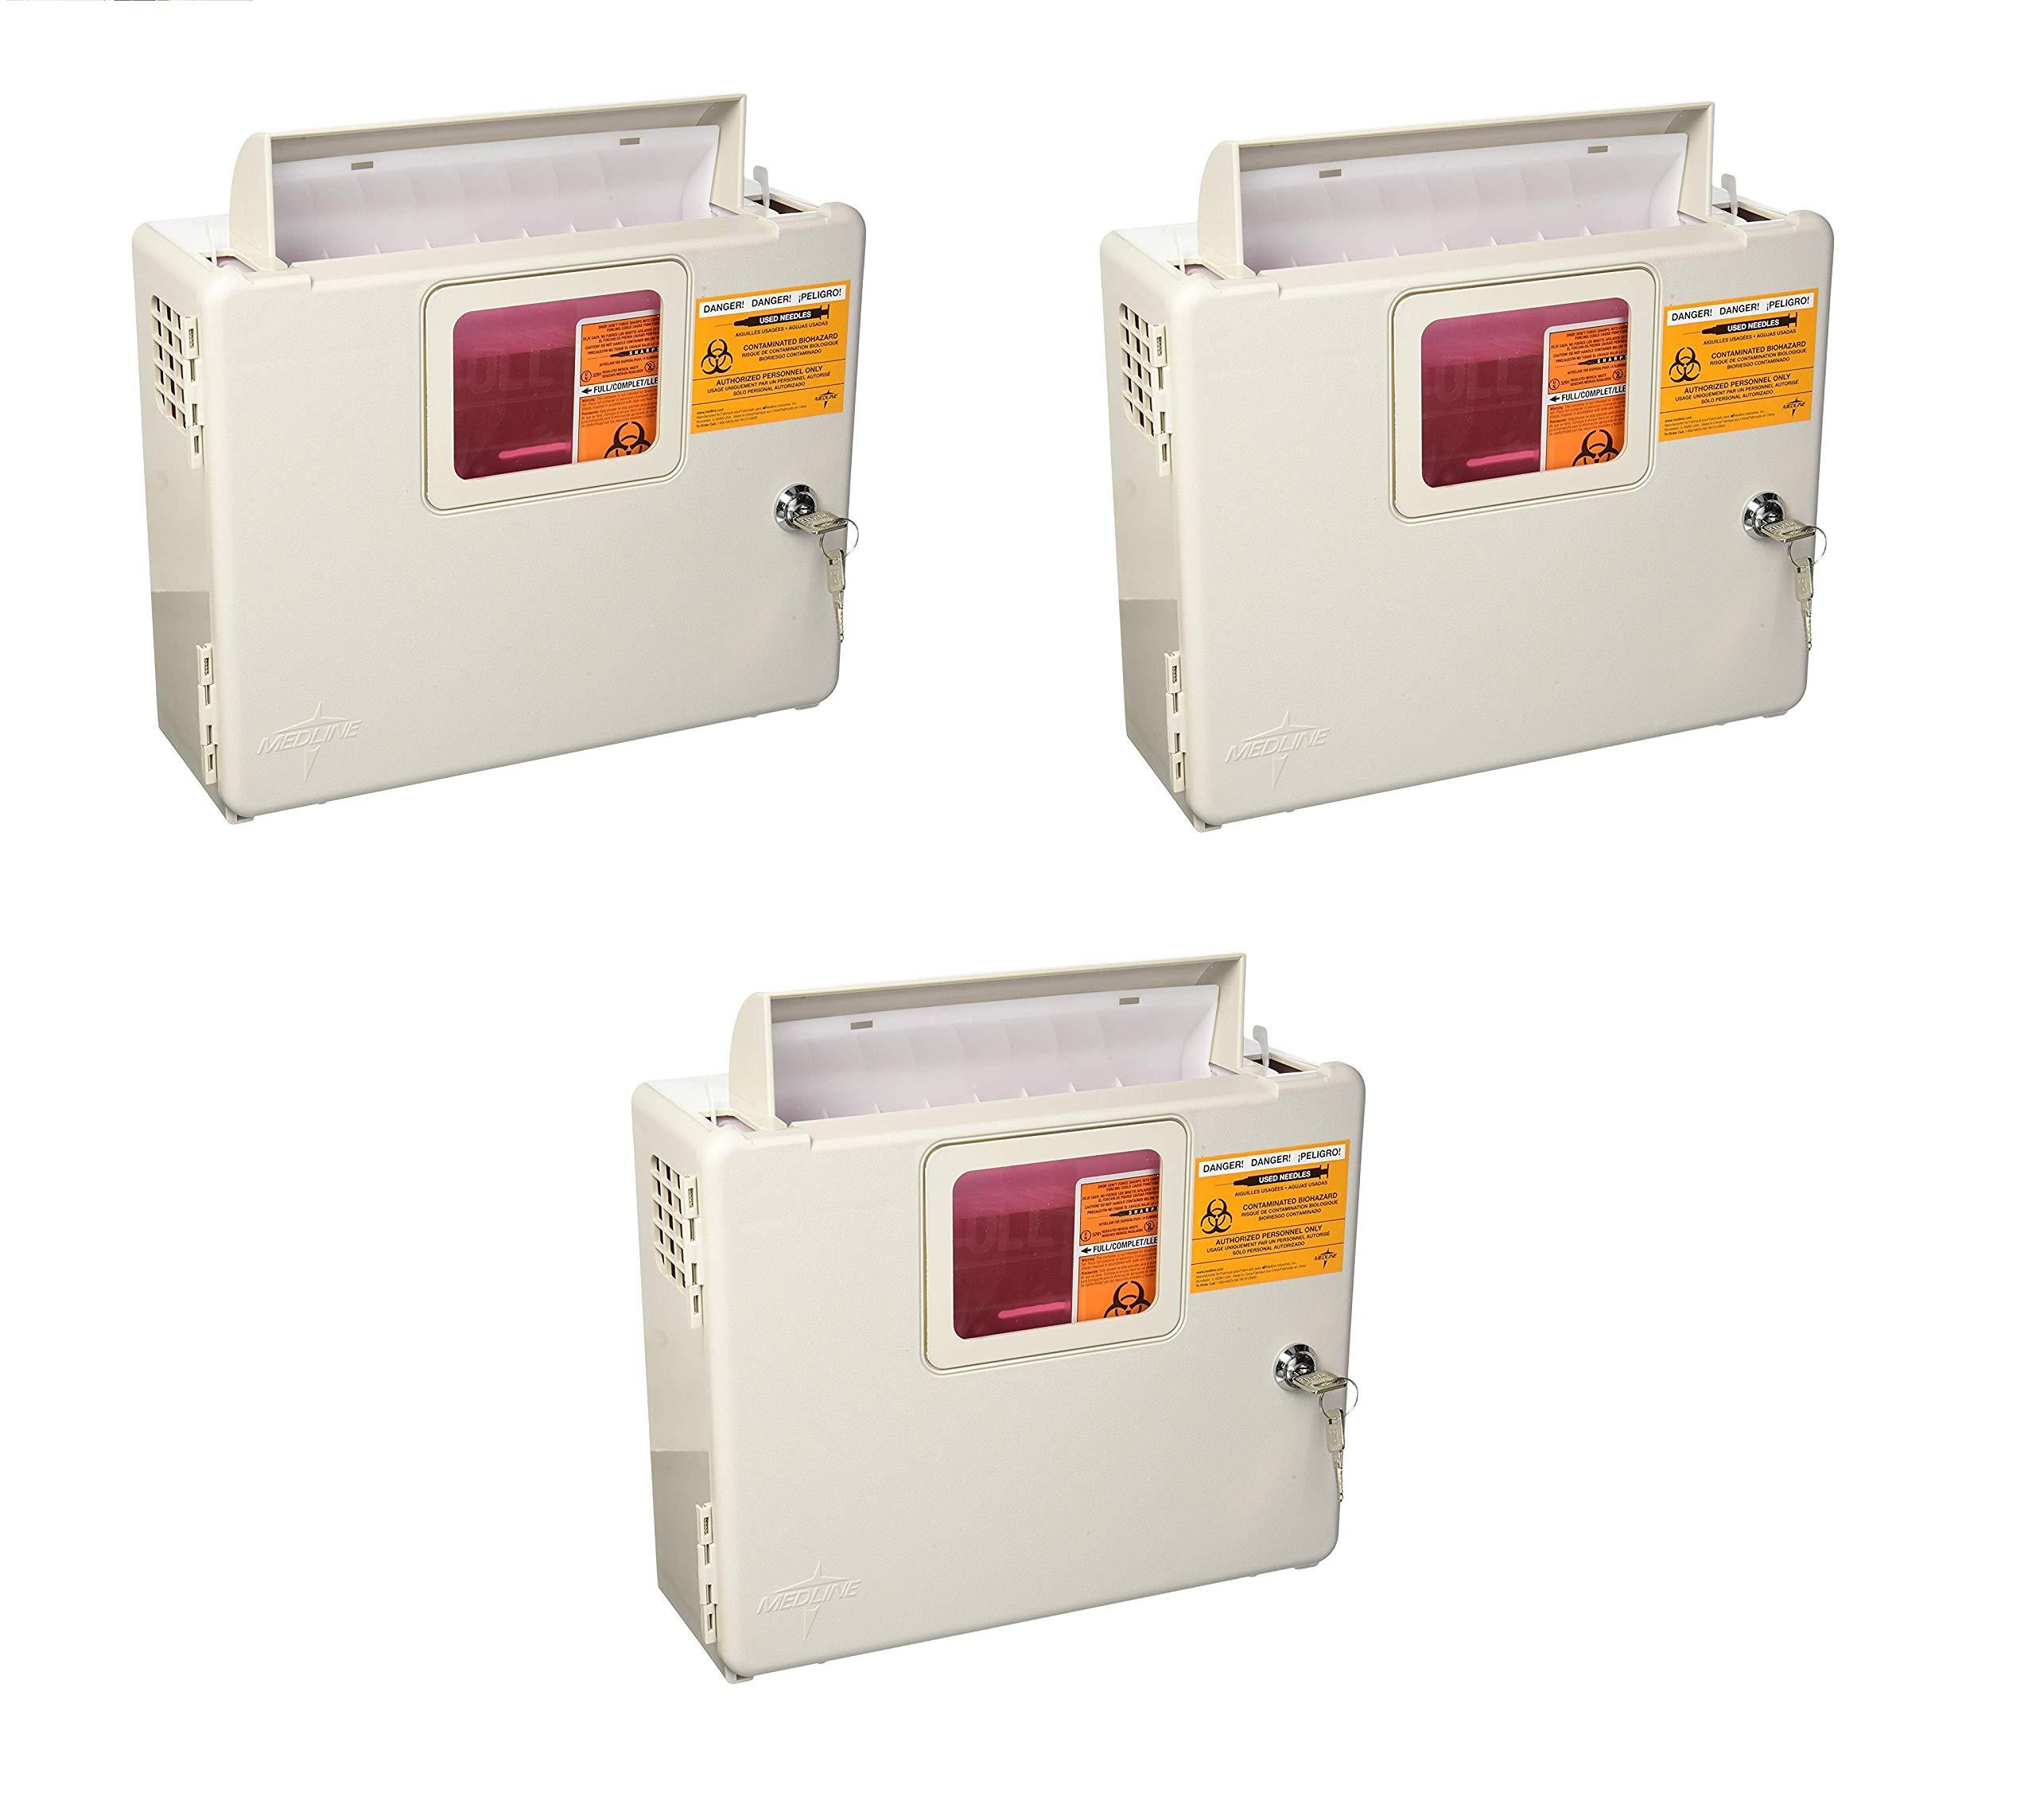 Kendall Wall Cabinet F/5Qt Sharps - Model 85161h (3 Pck)